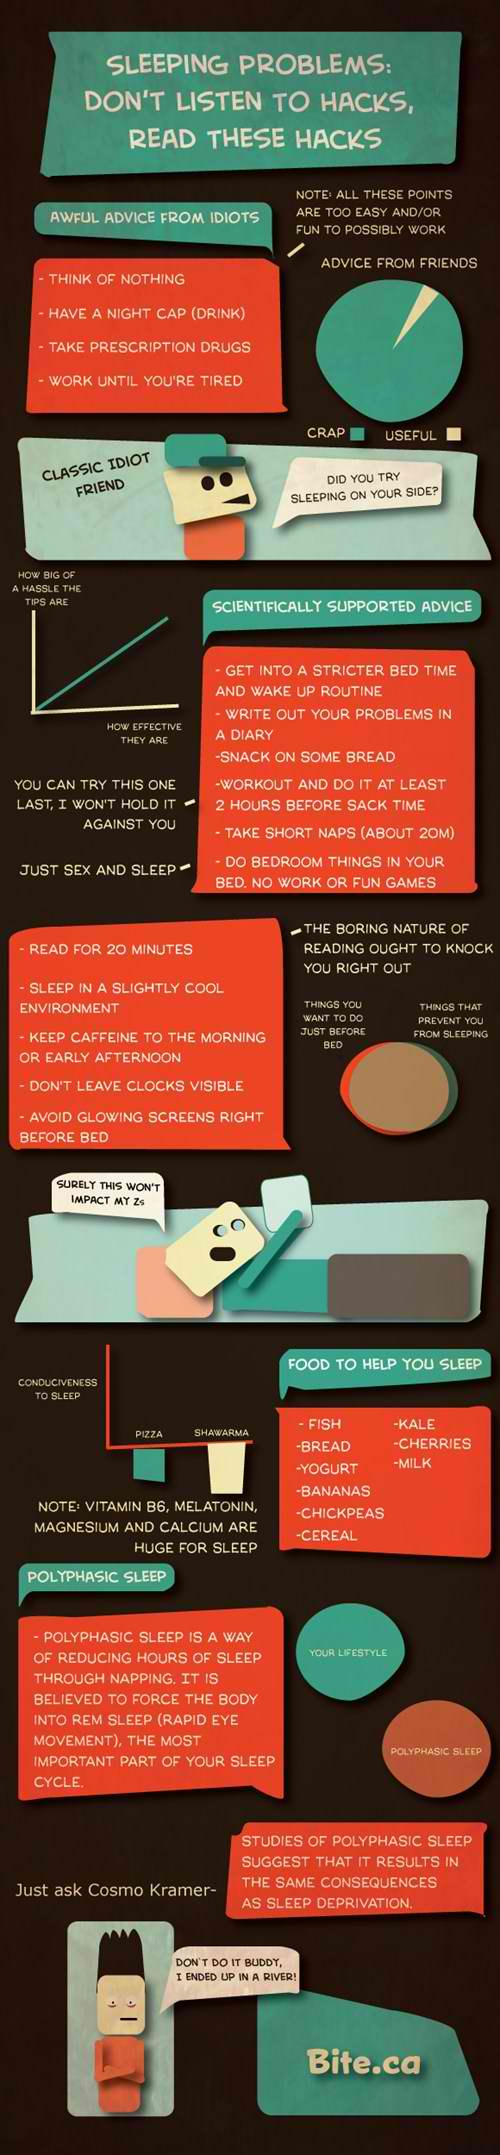 Sleeping_Problem_Hacks